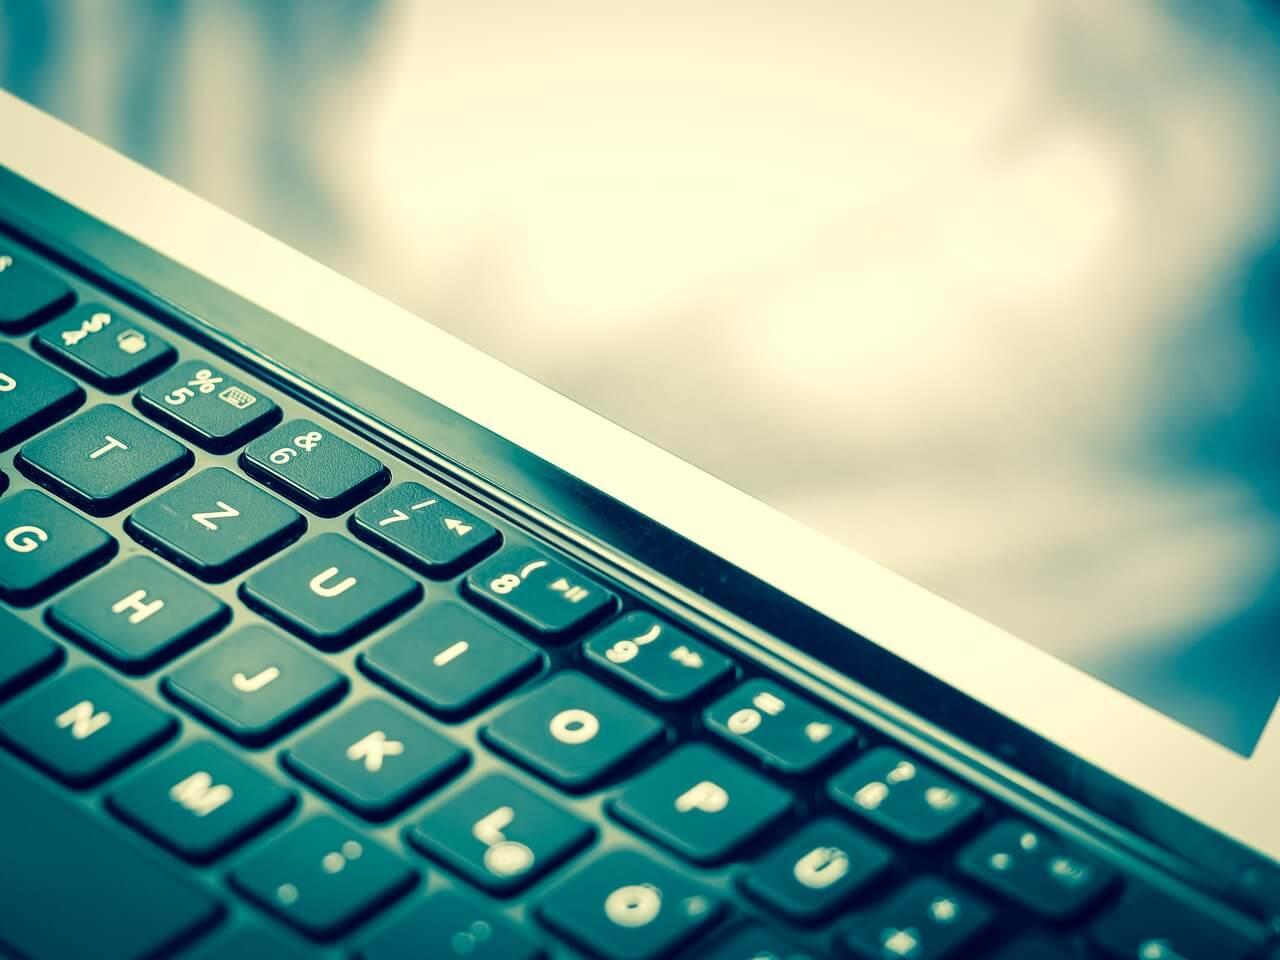 keyboard-946114_1280